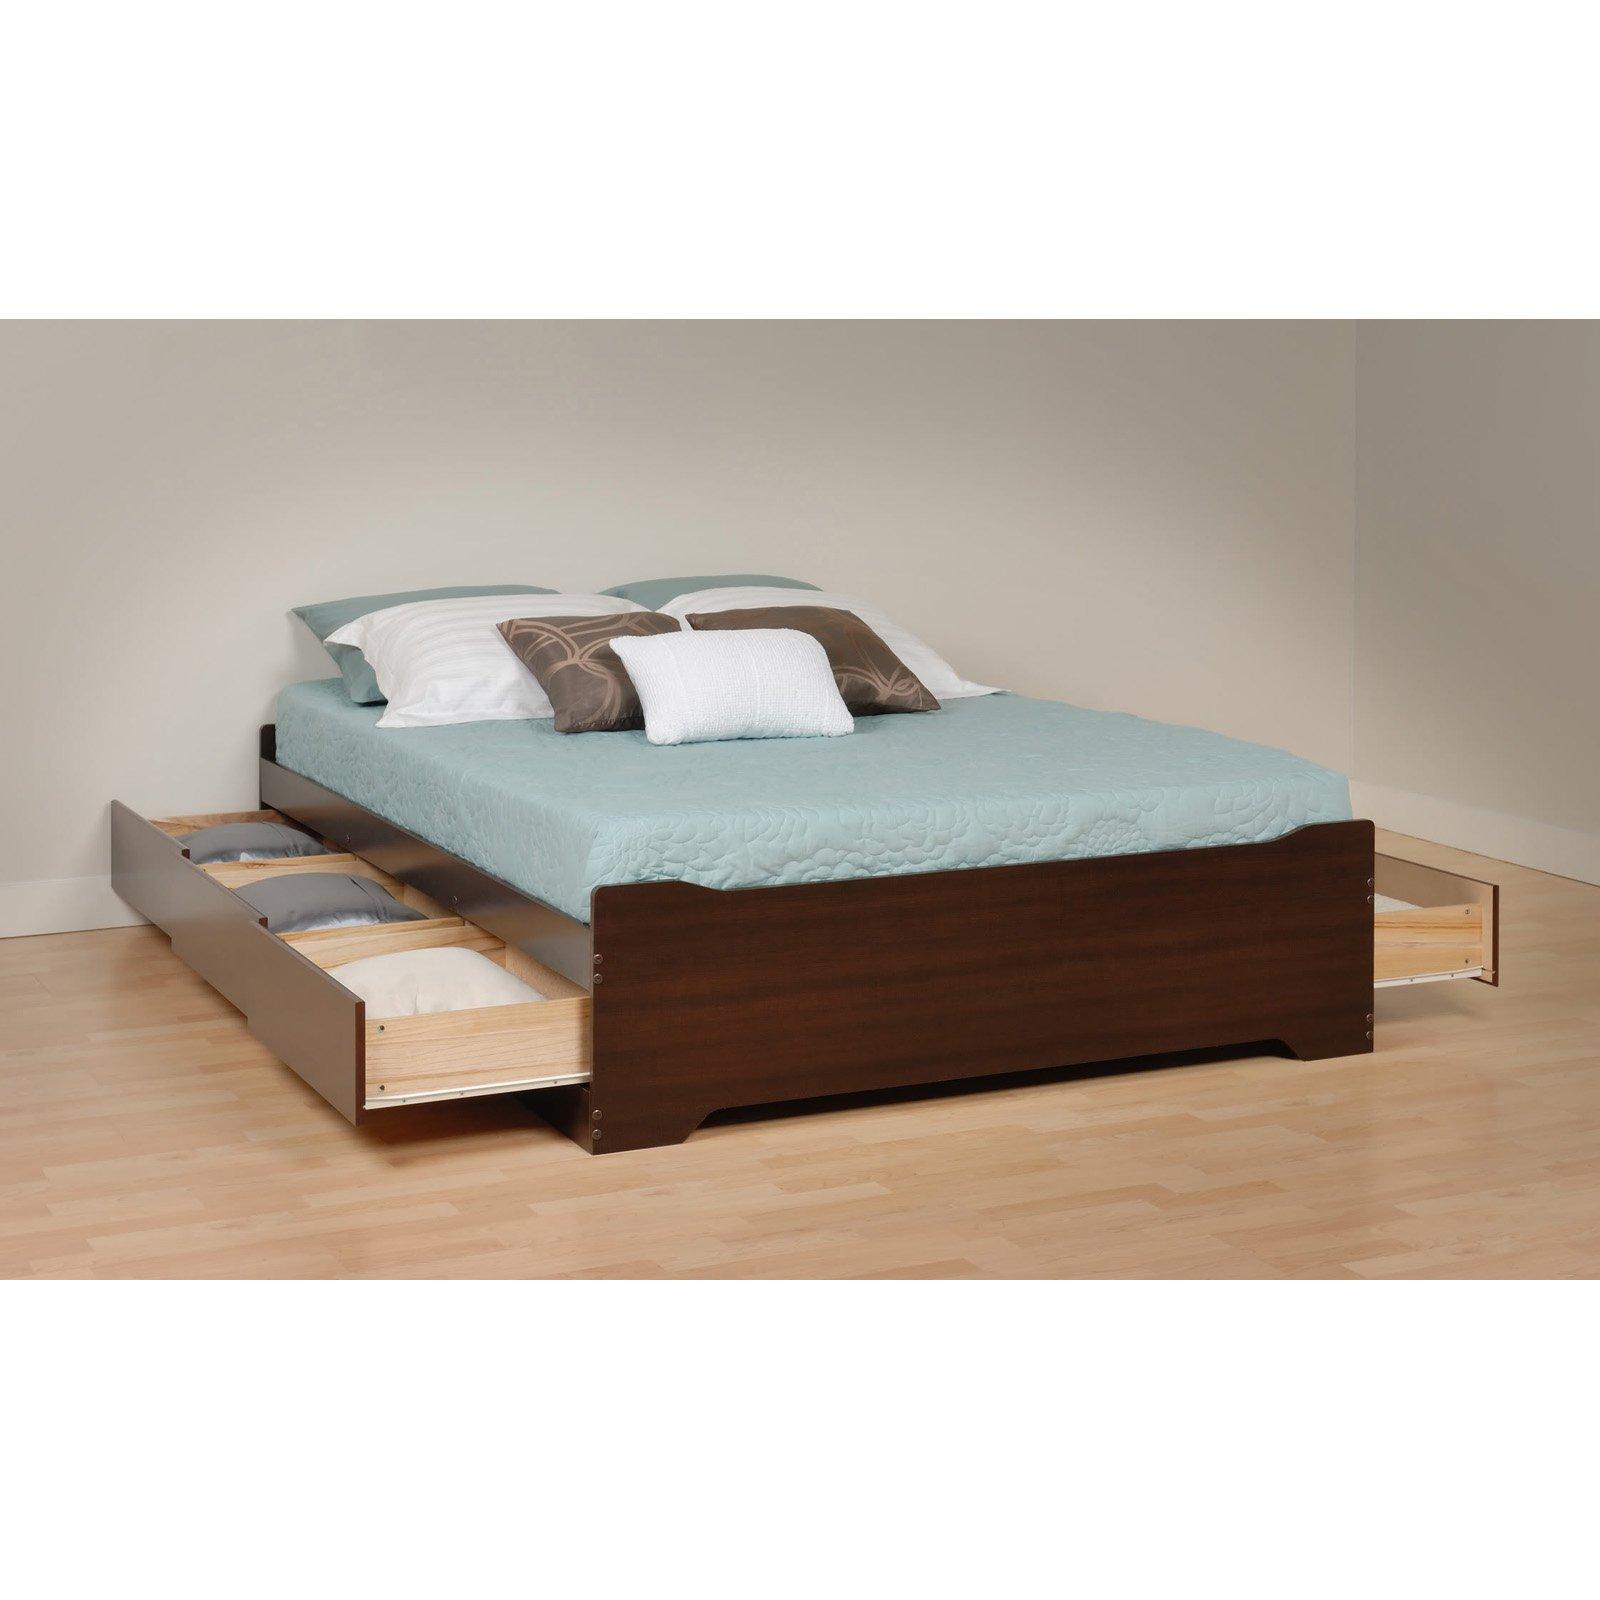 Coal Harbor Full Mates Platform Storage Bed with 6 Drawers, Espresso (Box 2 of 3)